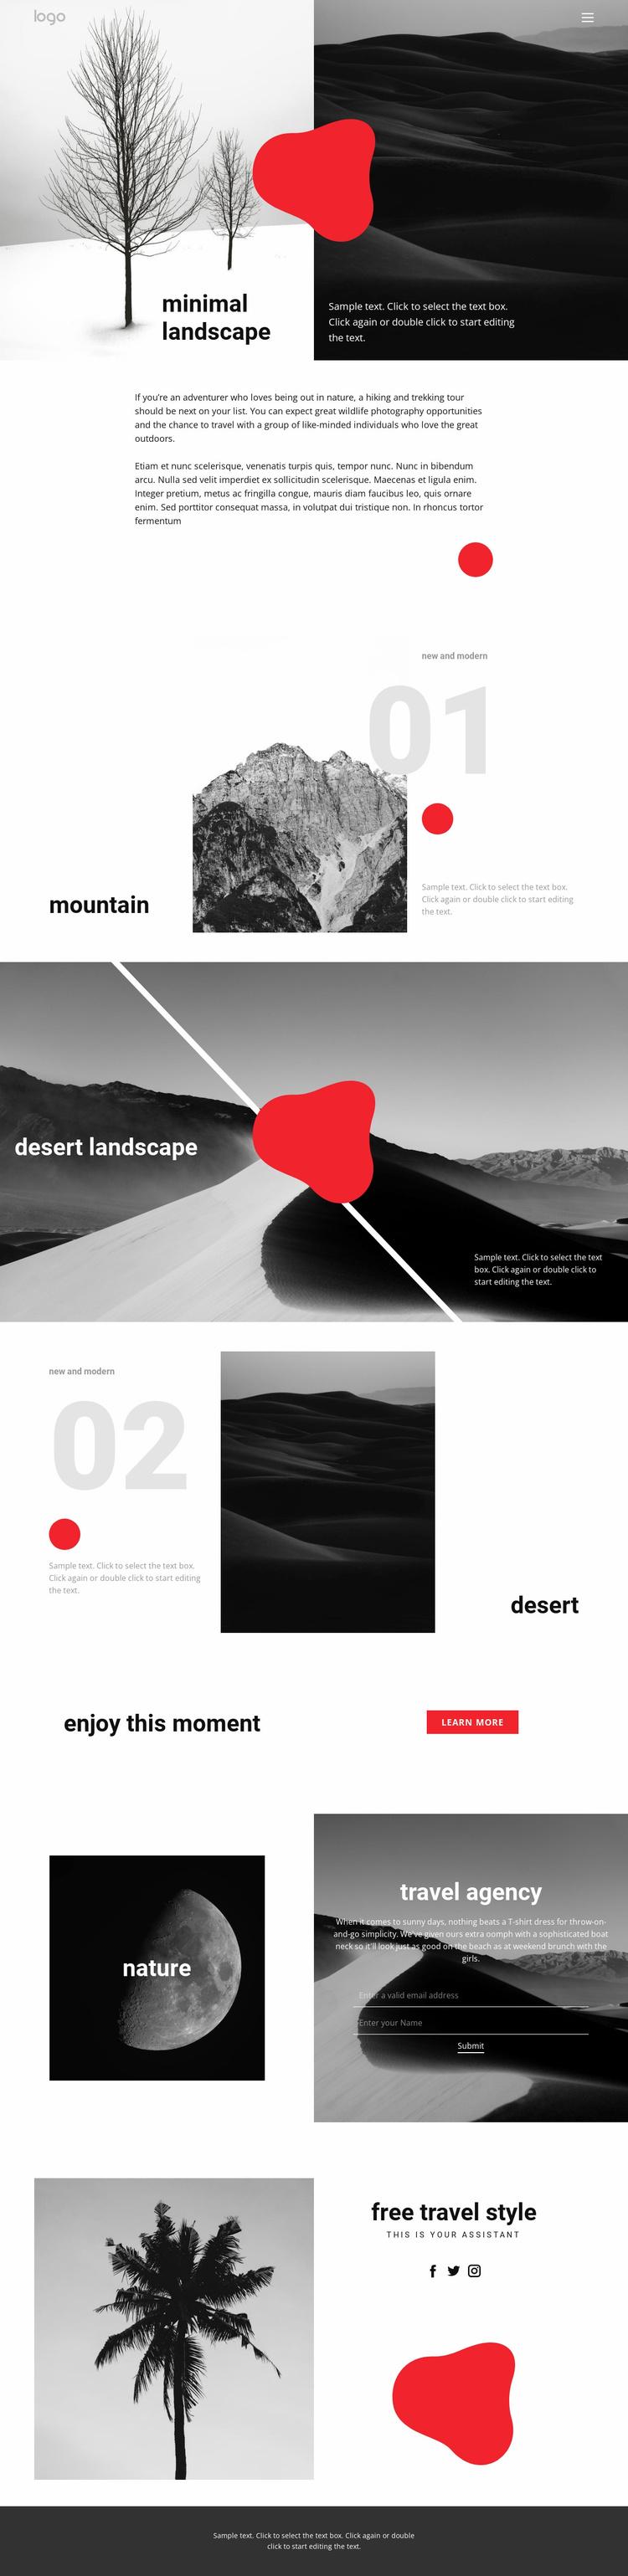 Minimal landscape photo Website Template